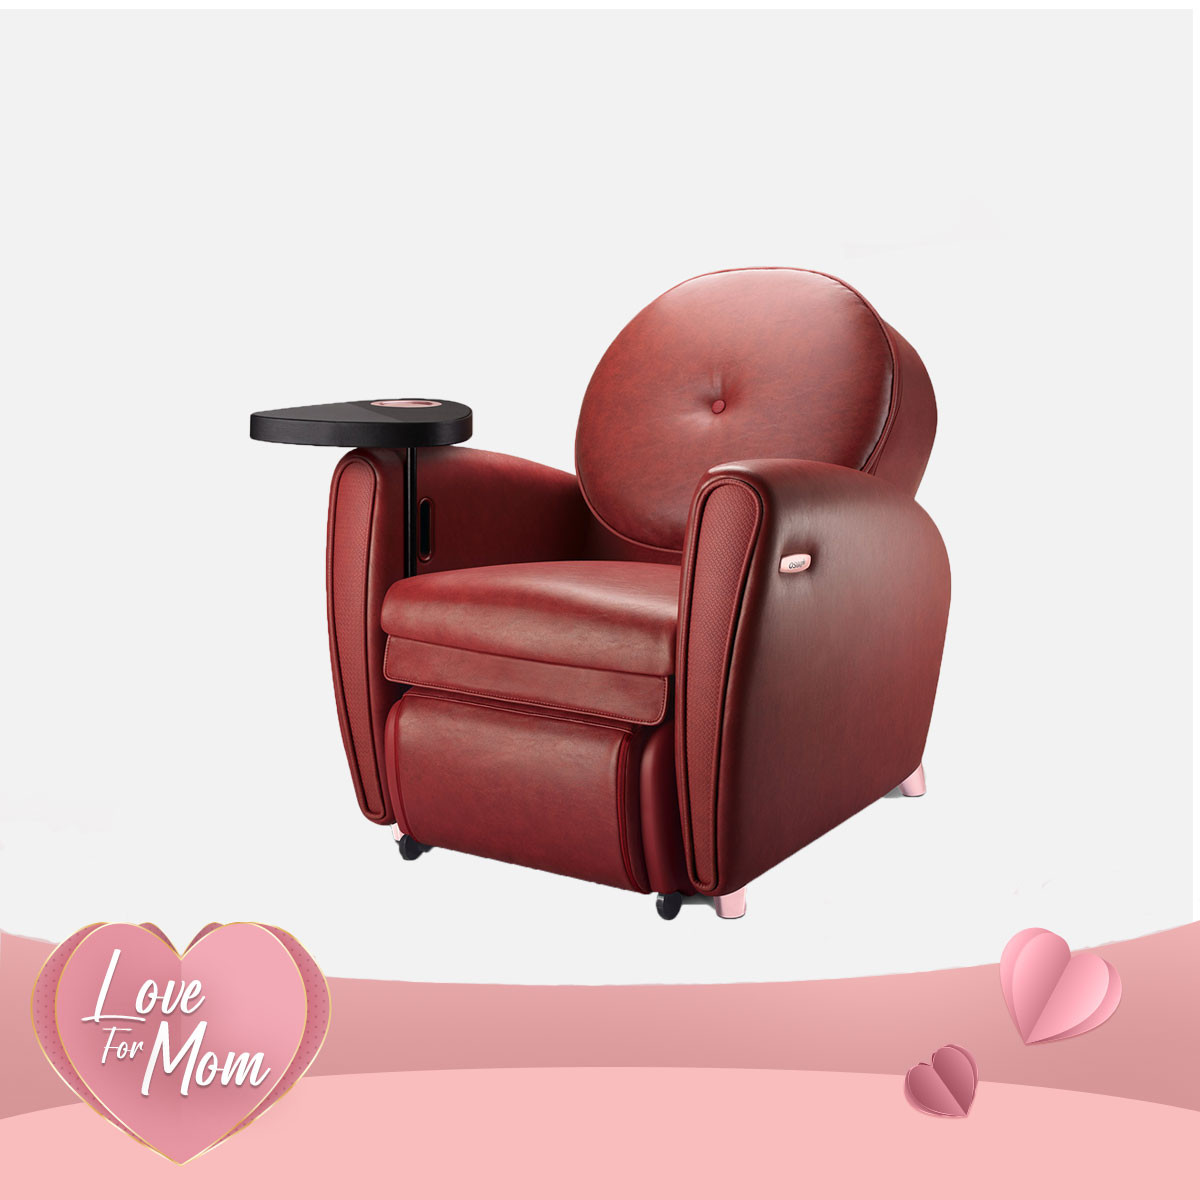 uDiva 2 Enhanced Massage Sofa